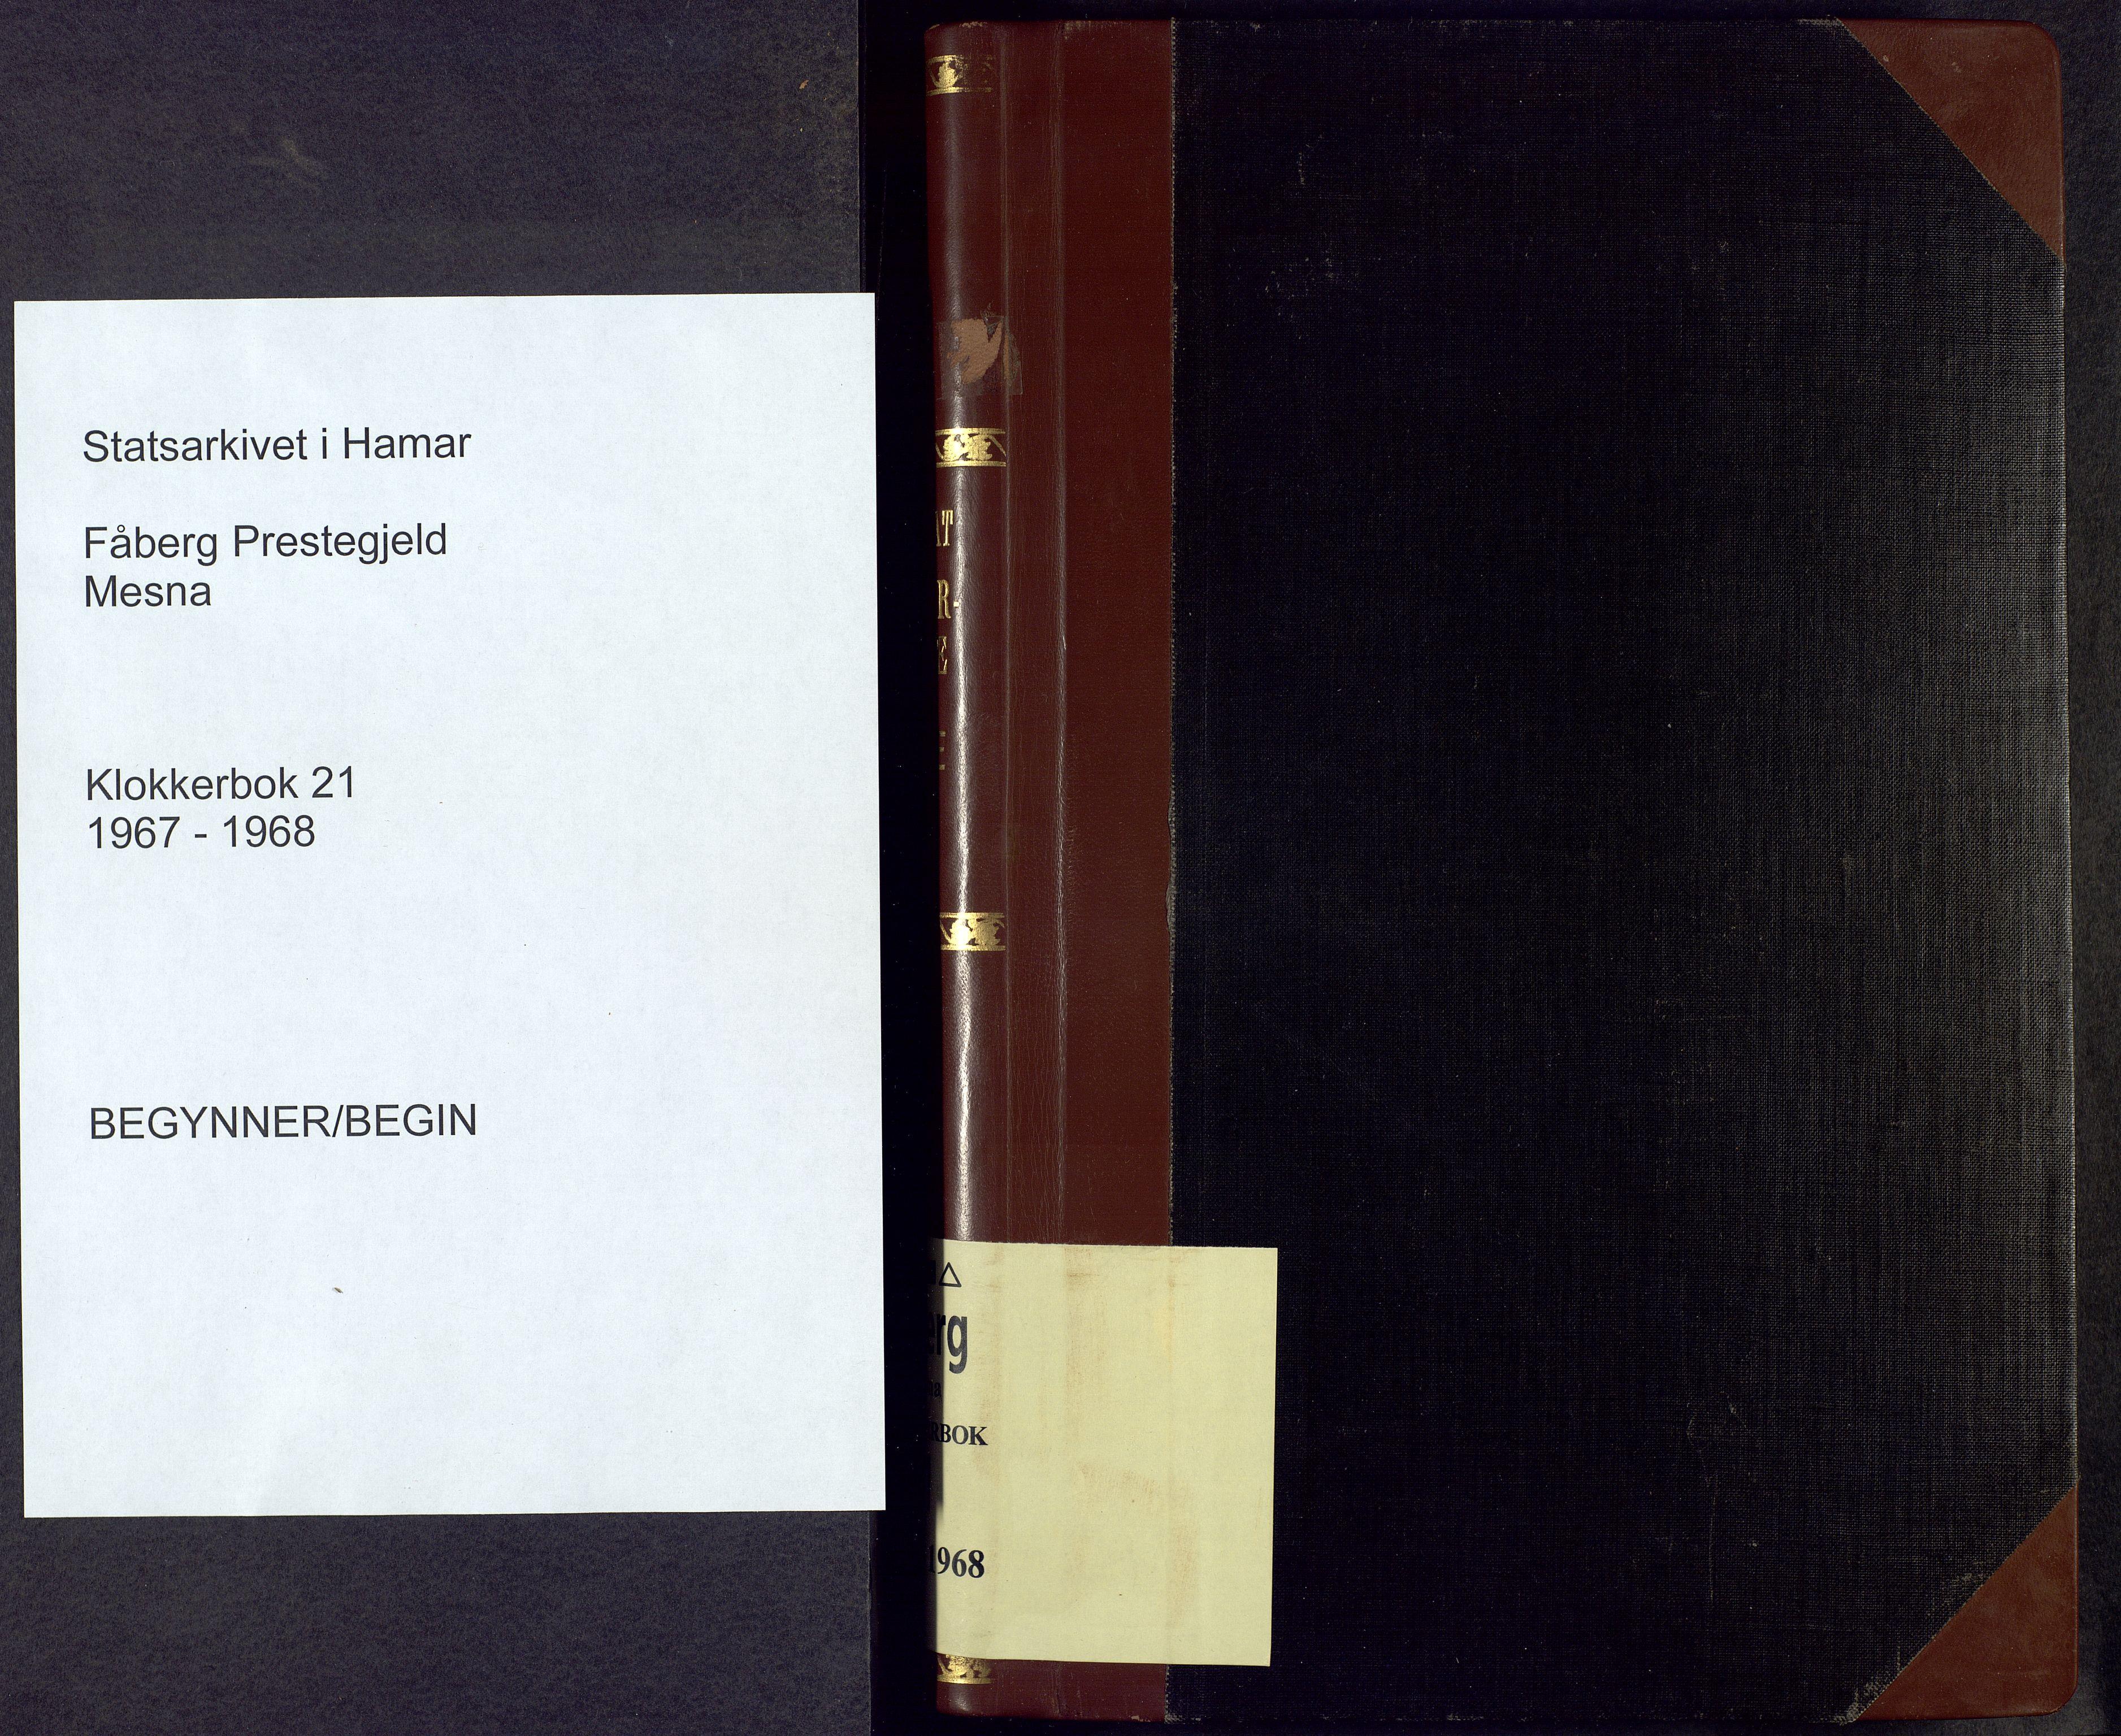 SAH, Fåberg prestekontor, H/Ha/Hab/L0021: Parish register (copy) no. 21, 1967-1968